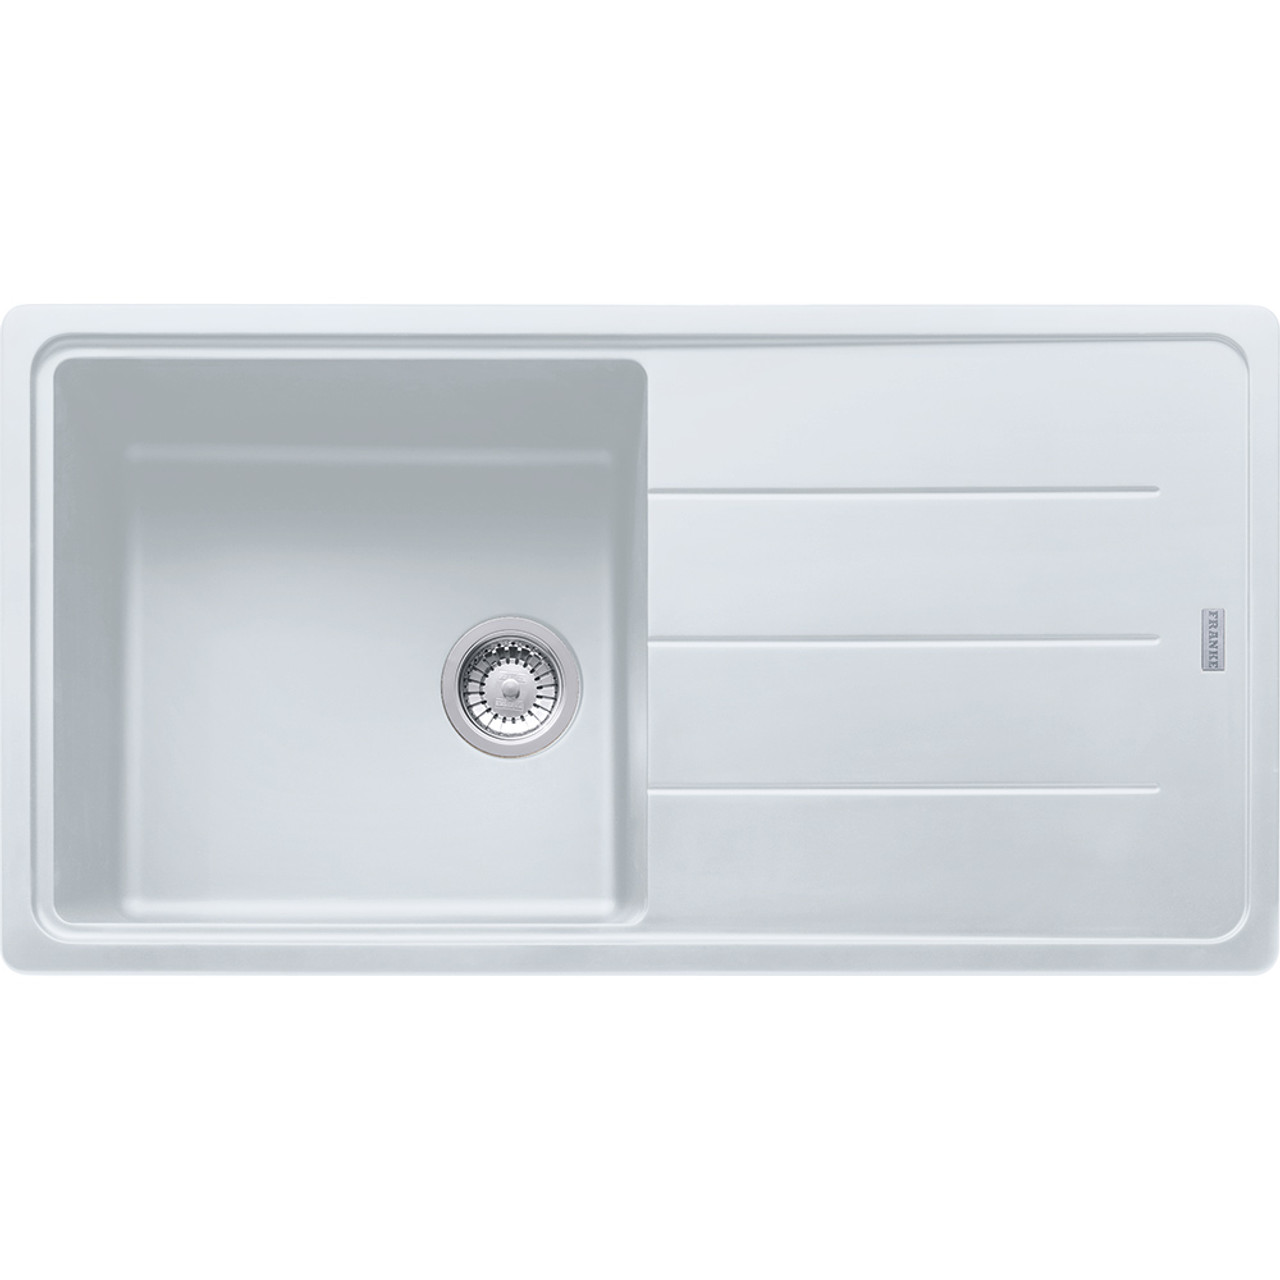 Franke Basis BFG611 970 Fragranite Polar White Kitchen Sink ...